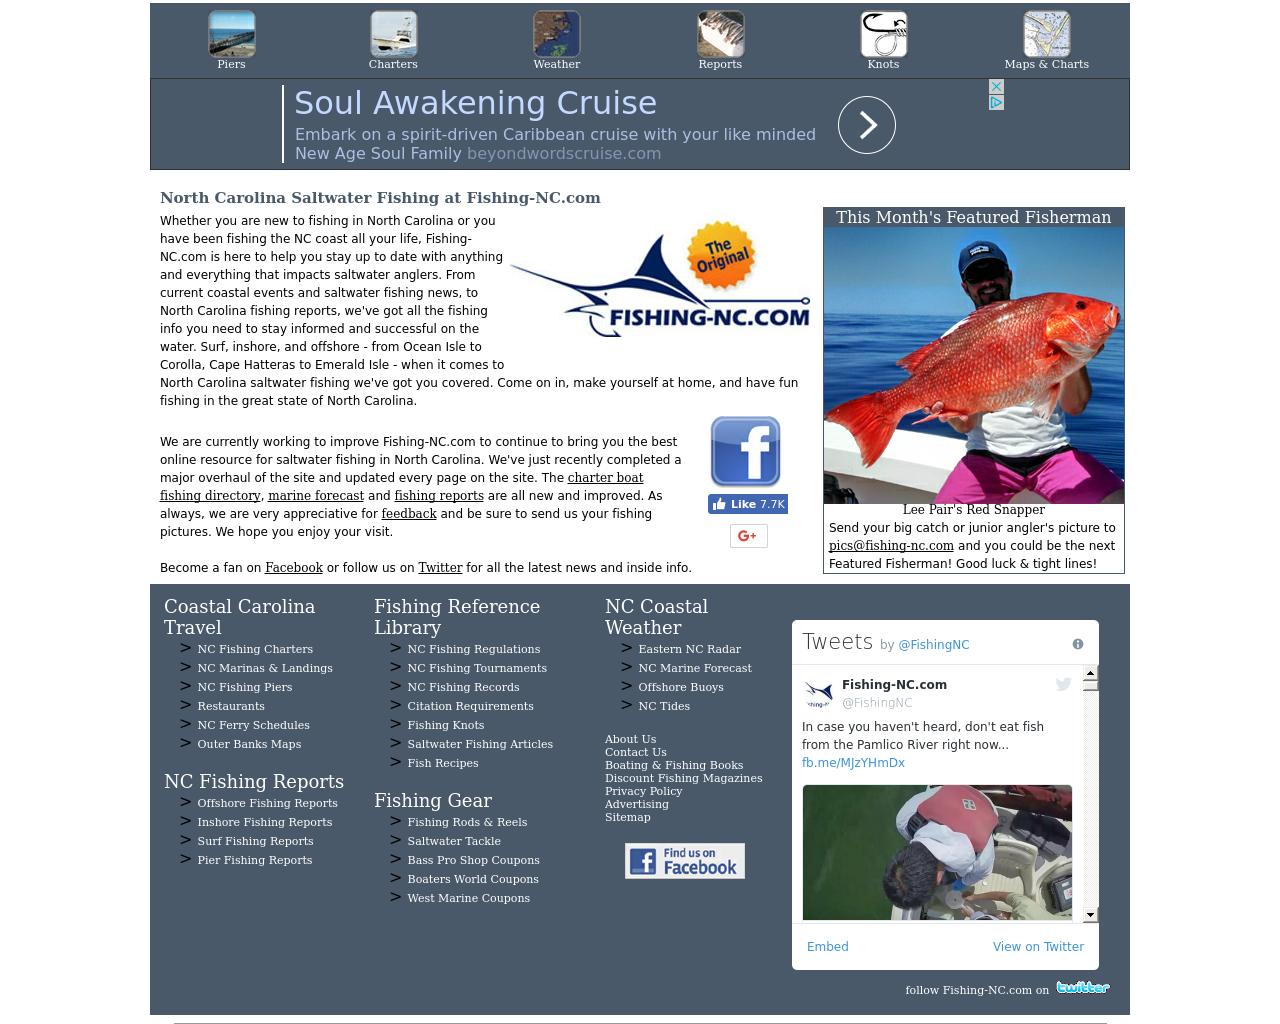 FISHING-NC.COM-Advertising-Reviews-Pricing